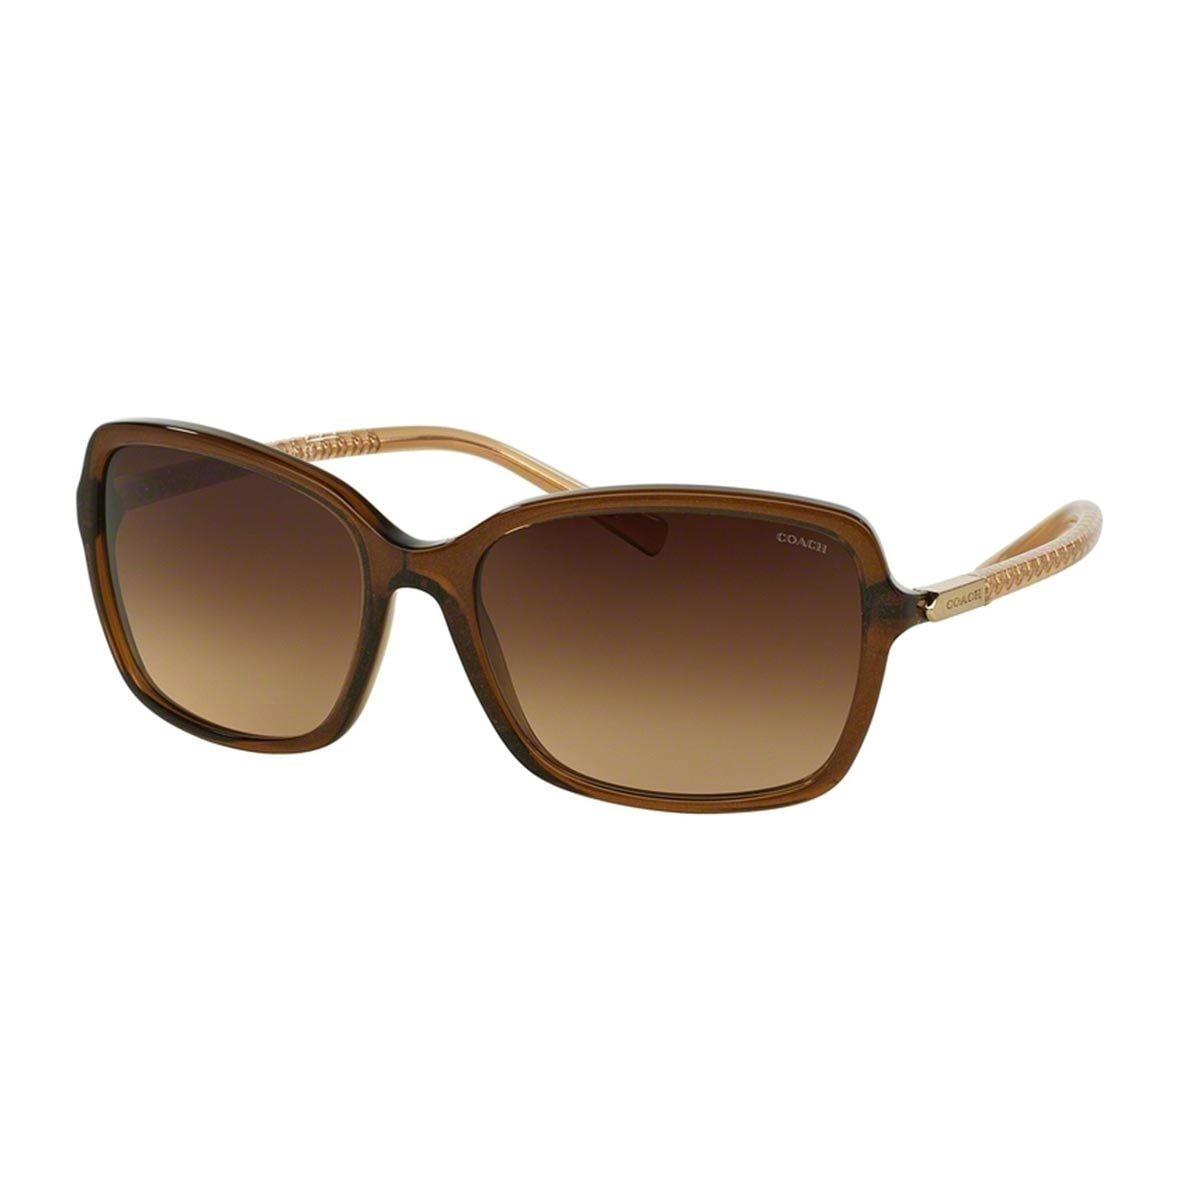 d8b8f79a1f ... hot coach womens hc8152 brown plastic square sunglasses free shipping  today overstock 17897006 19696 ebf7e